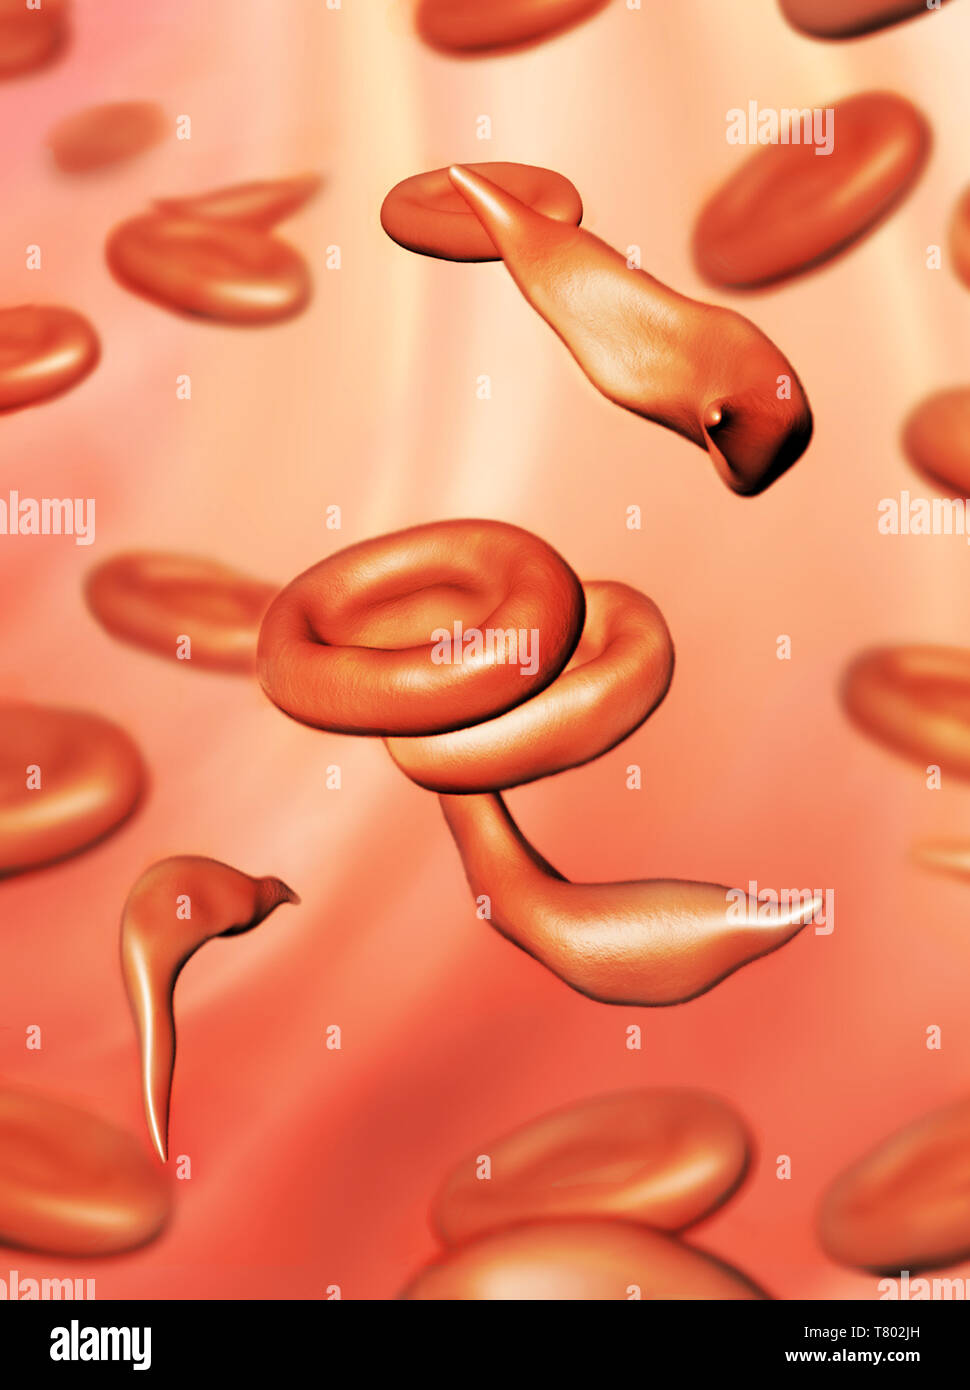 Sickle Cells, Illustration - Stock Image